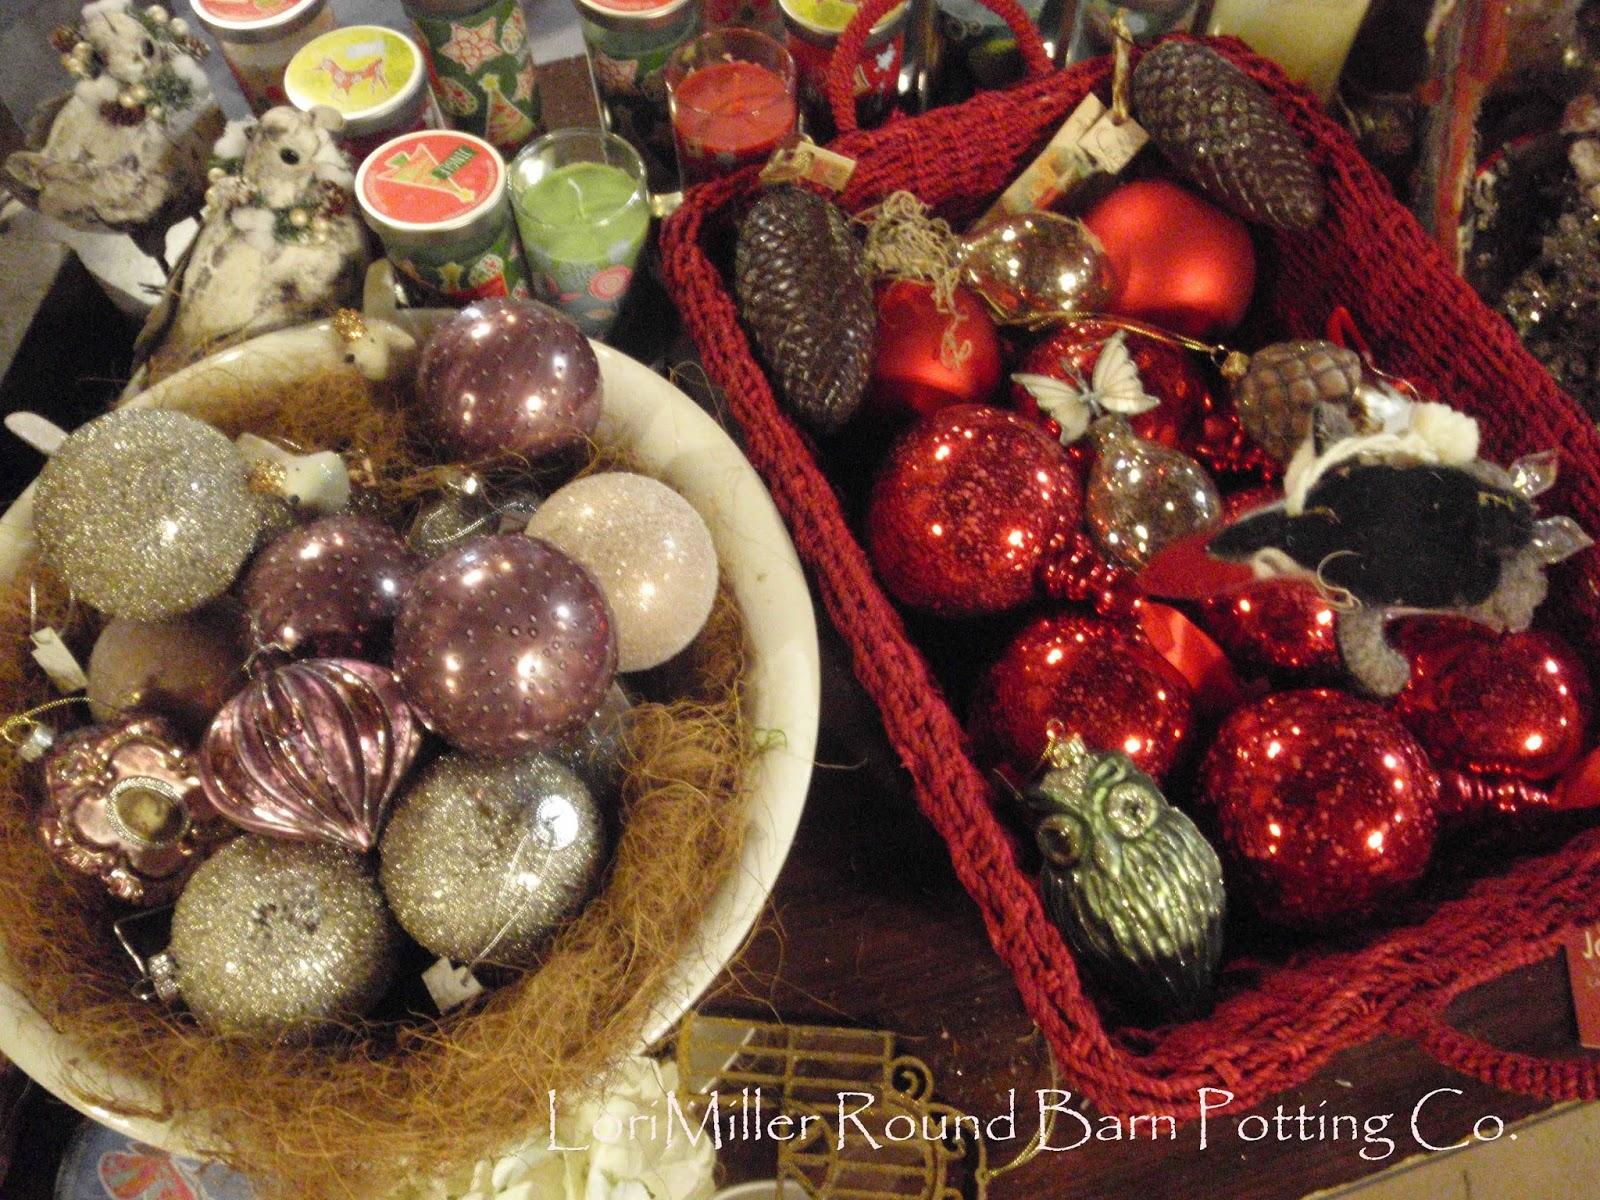 Lori Miller S Round Barn Potting Company Final Days Rbpco